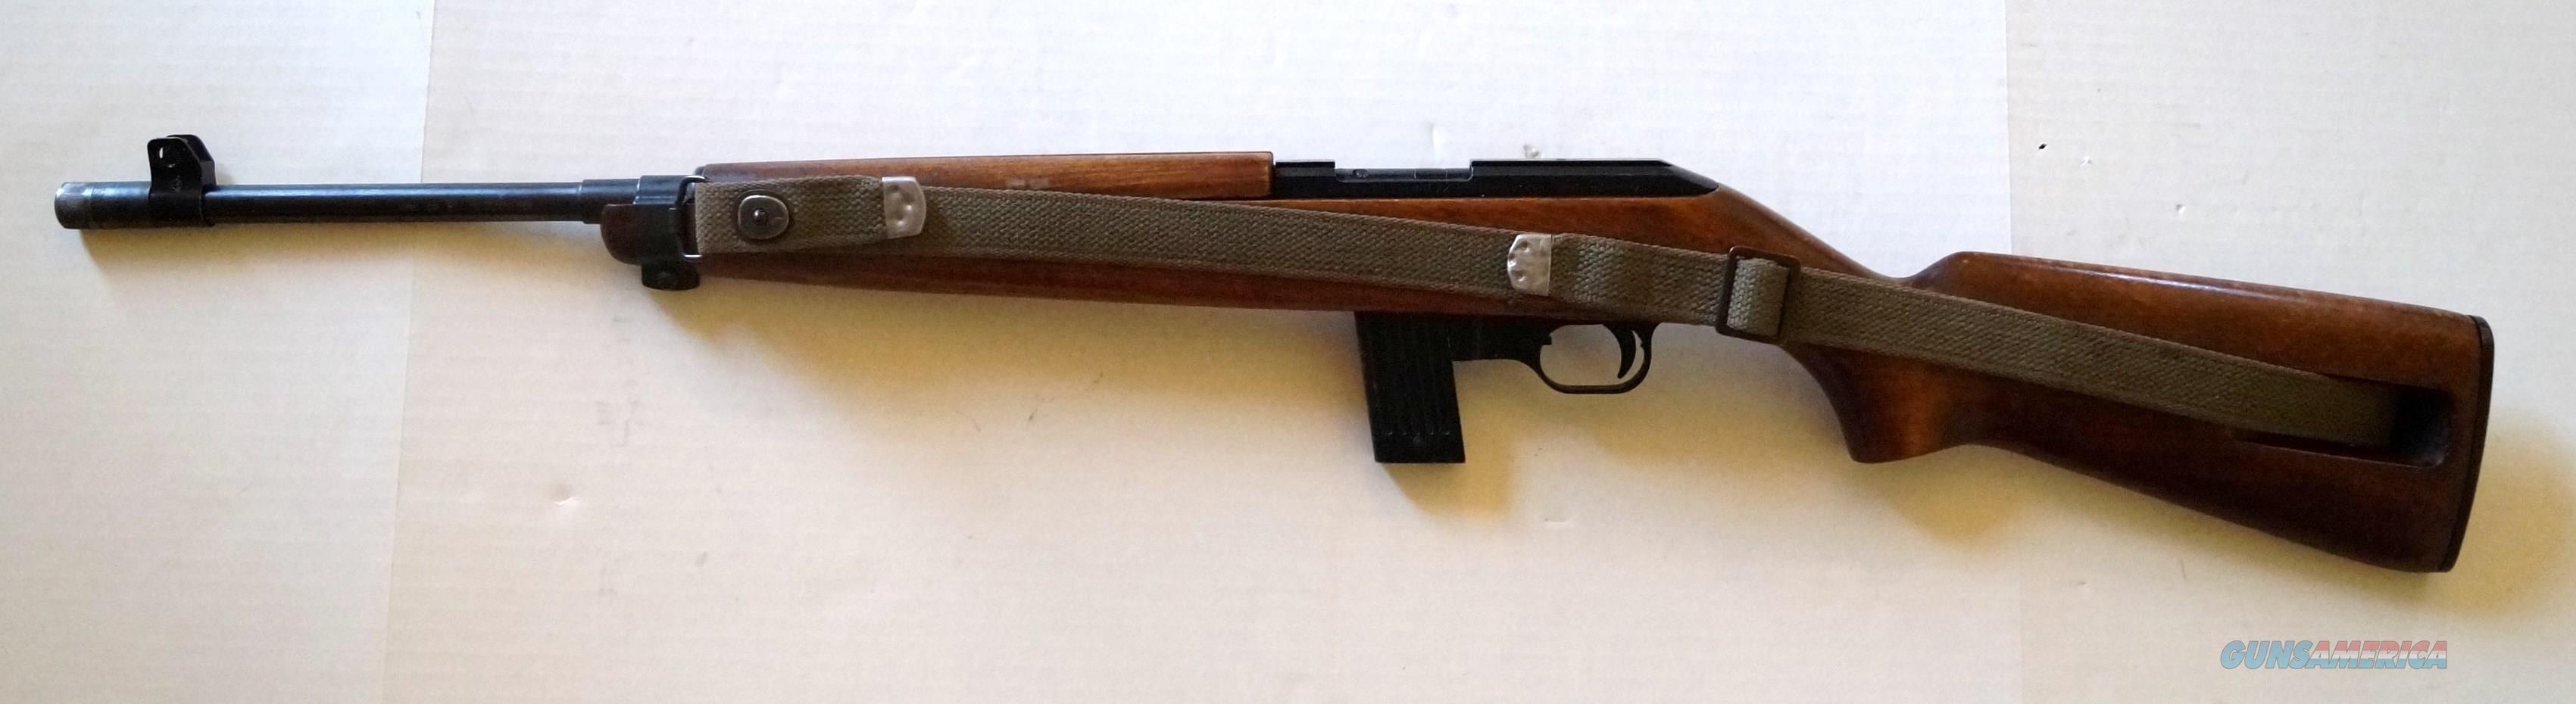 ERMA WERKE EM-1 CARBINE  Guns > Rifles > Erma/Erma Werke